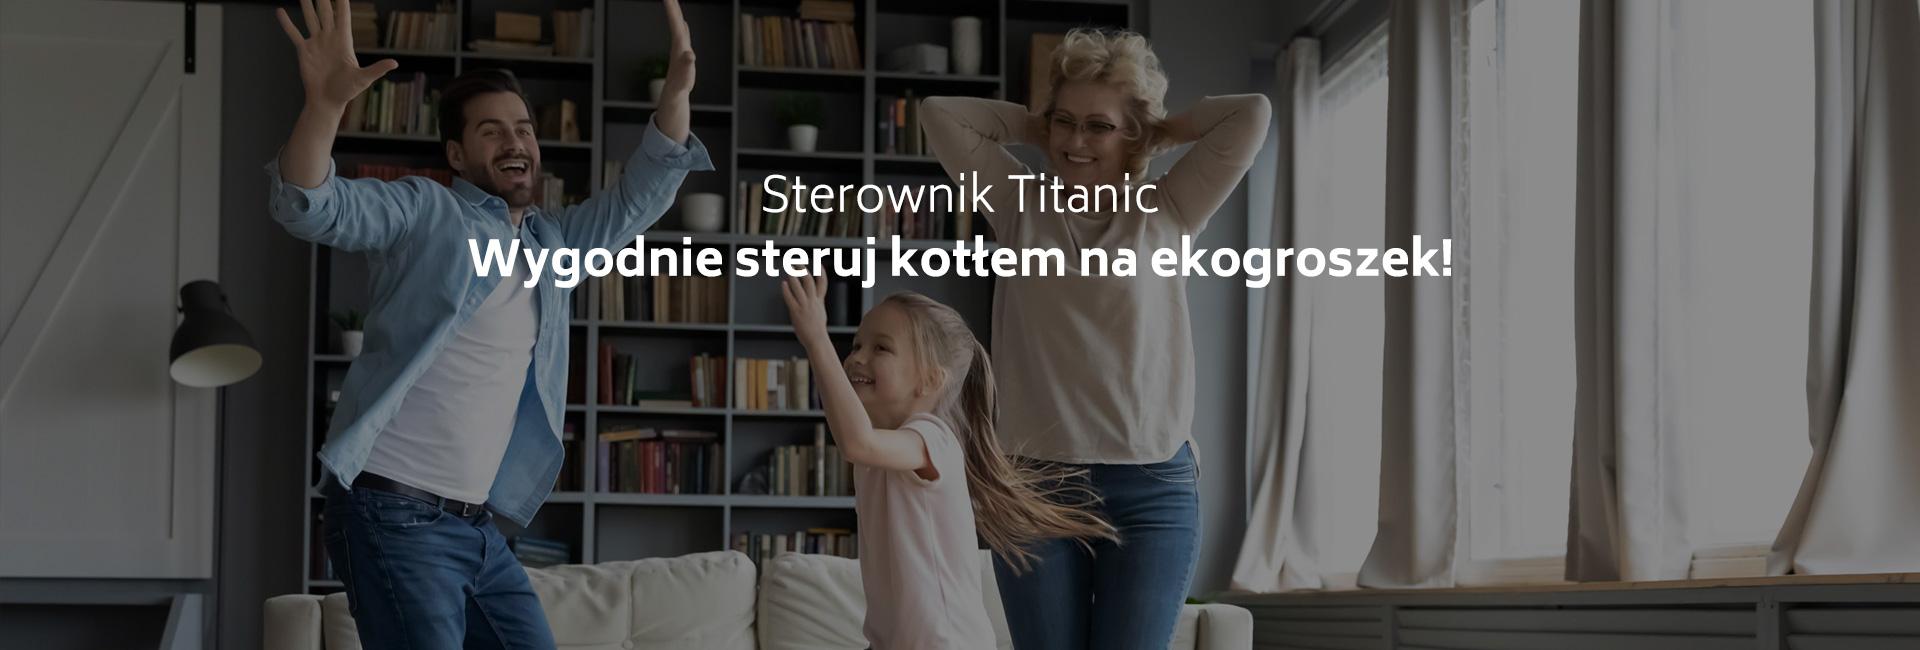 Sterownik Titanic - Kotły na ekogroszek